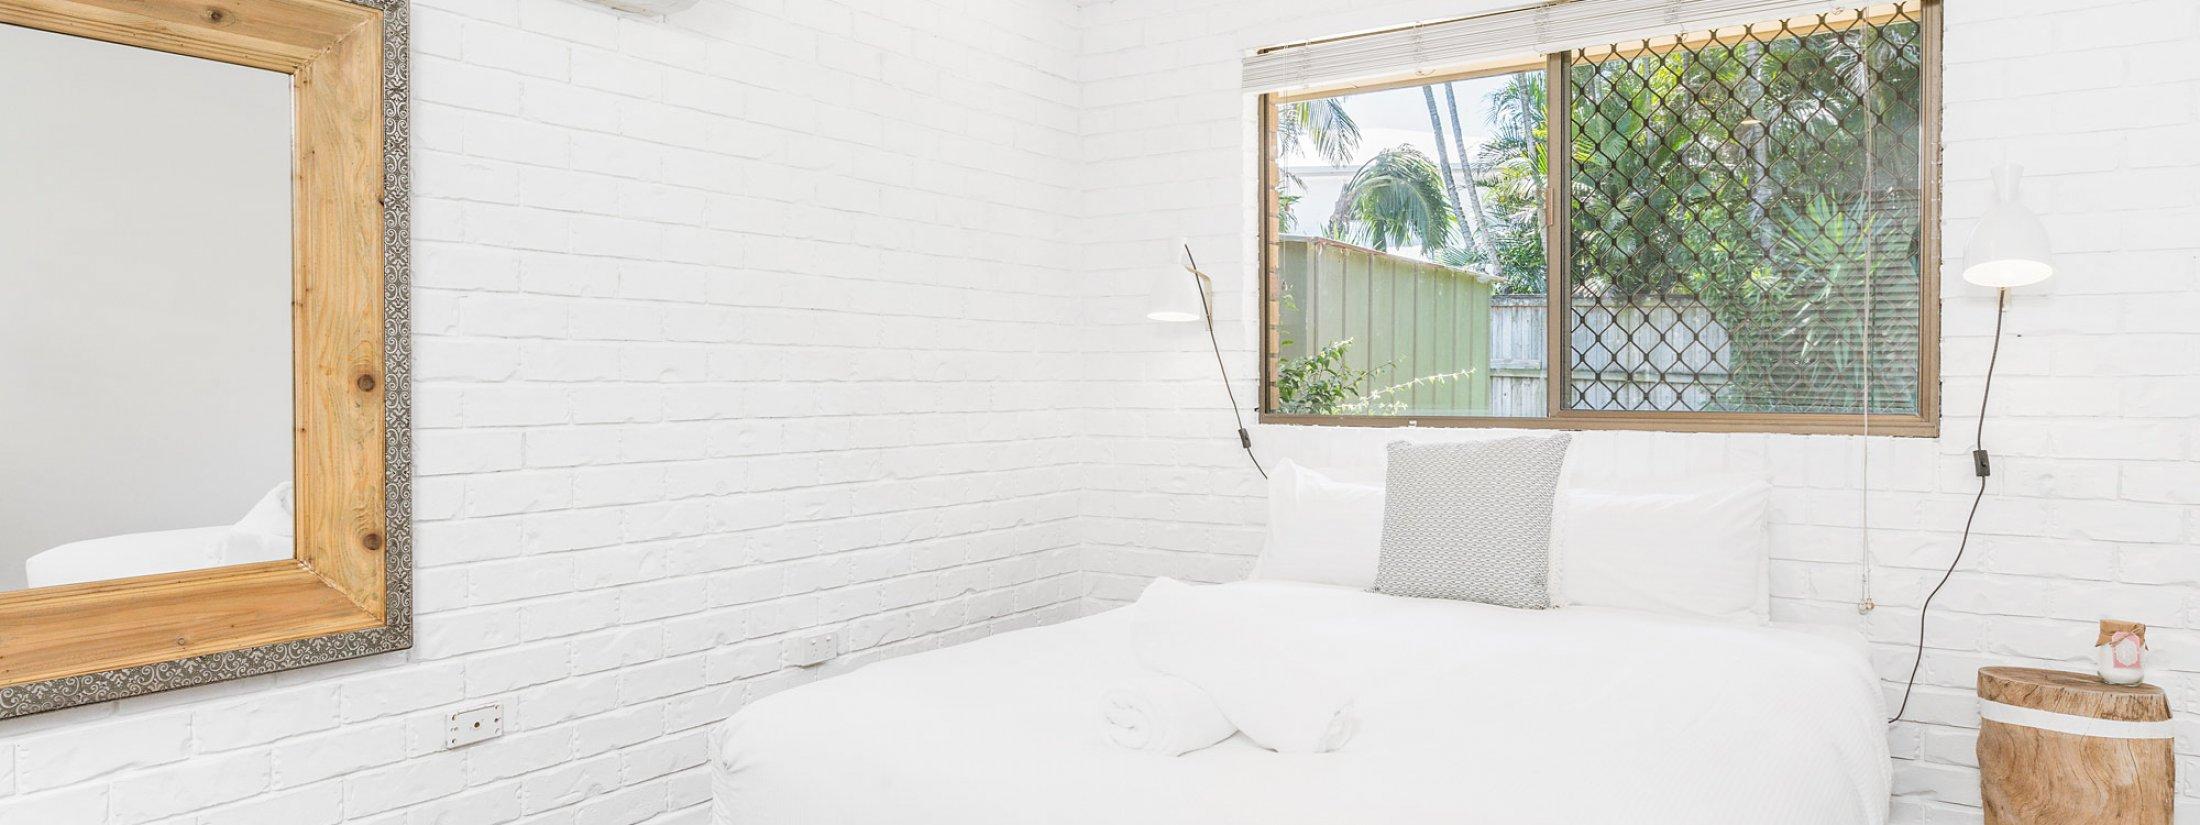 Sea Salt - Byron Bay - Master Bedroom